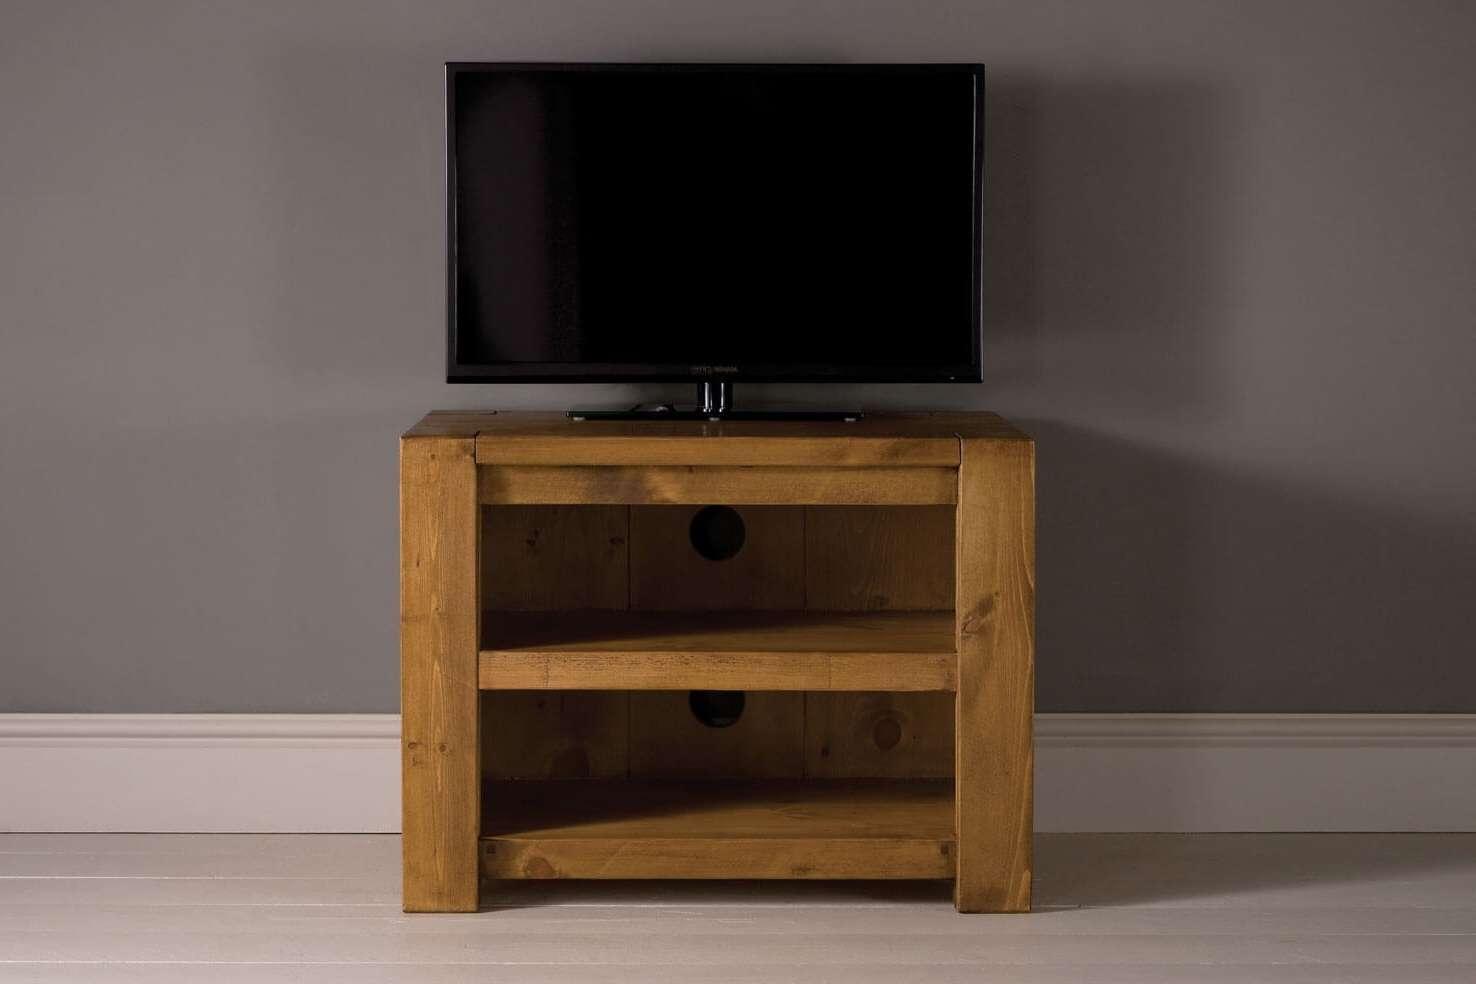 Midi Plank Beam Tv Cabinet With Shelfindigo Furniture Regarding Small Tv Cabinets (View 5 of 20)